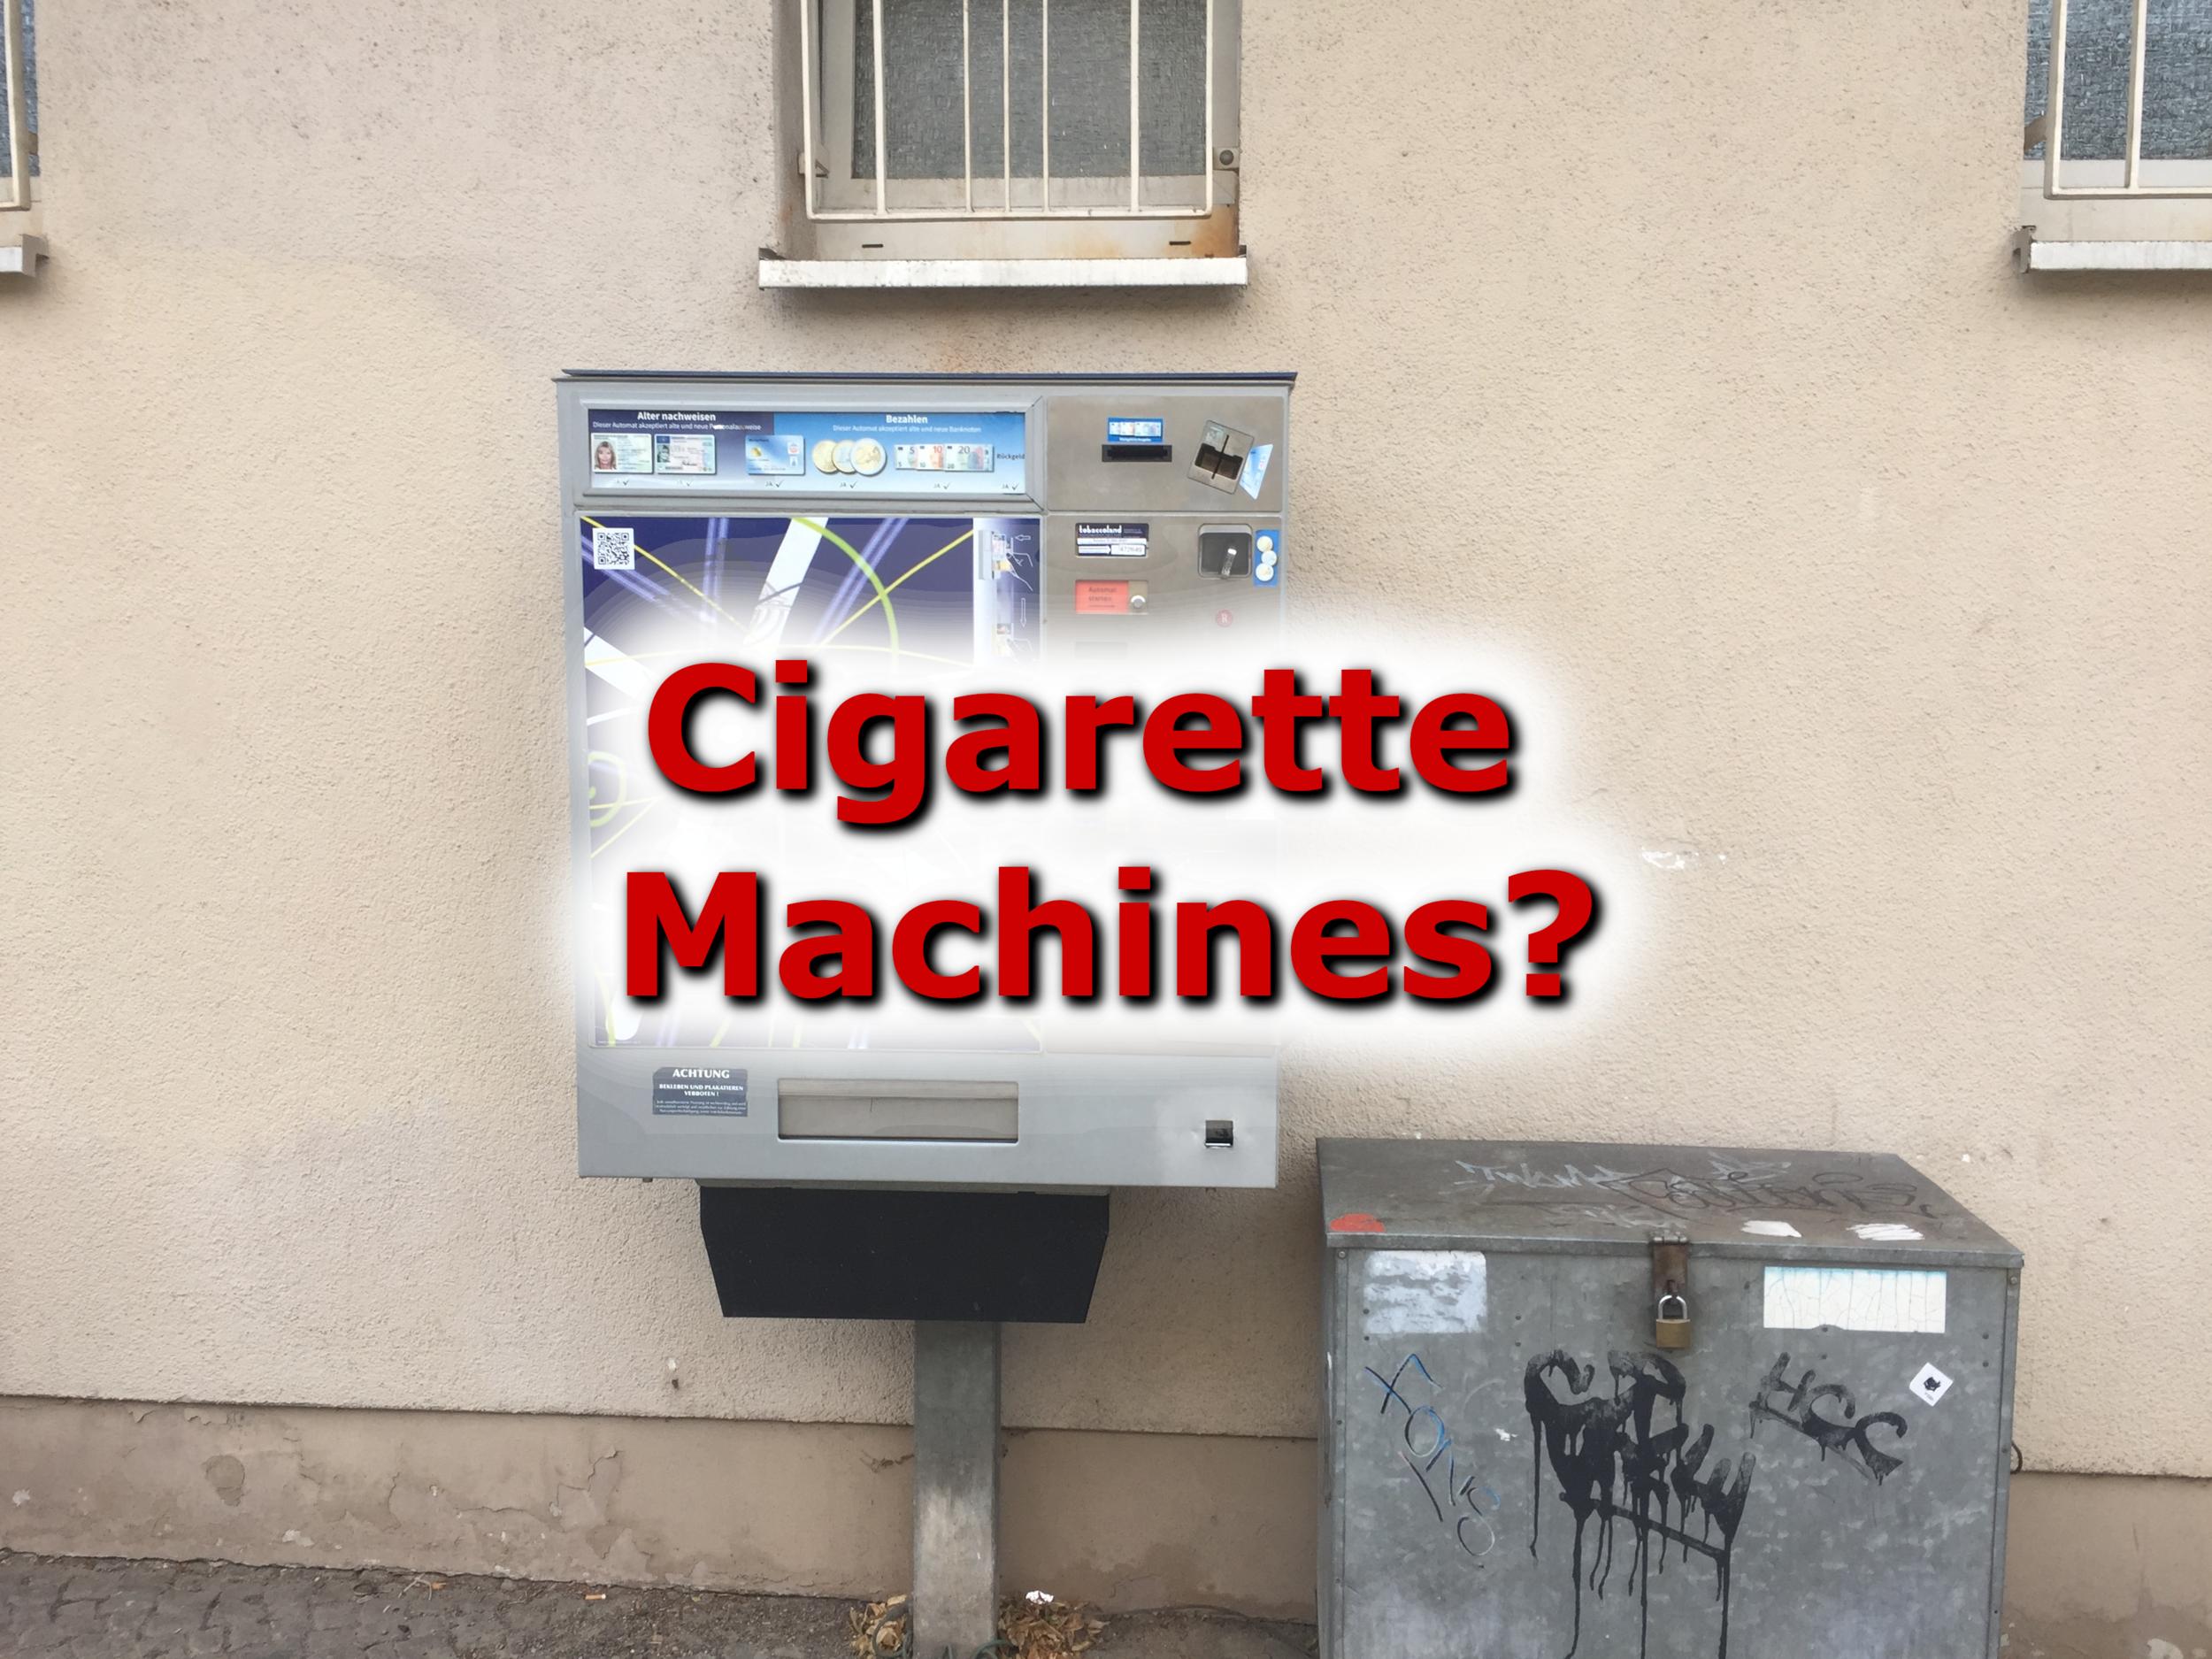 cigarette machines.jpeg